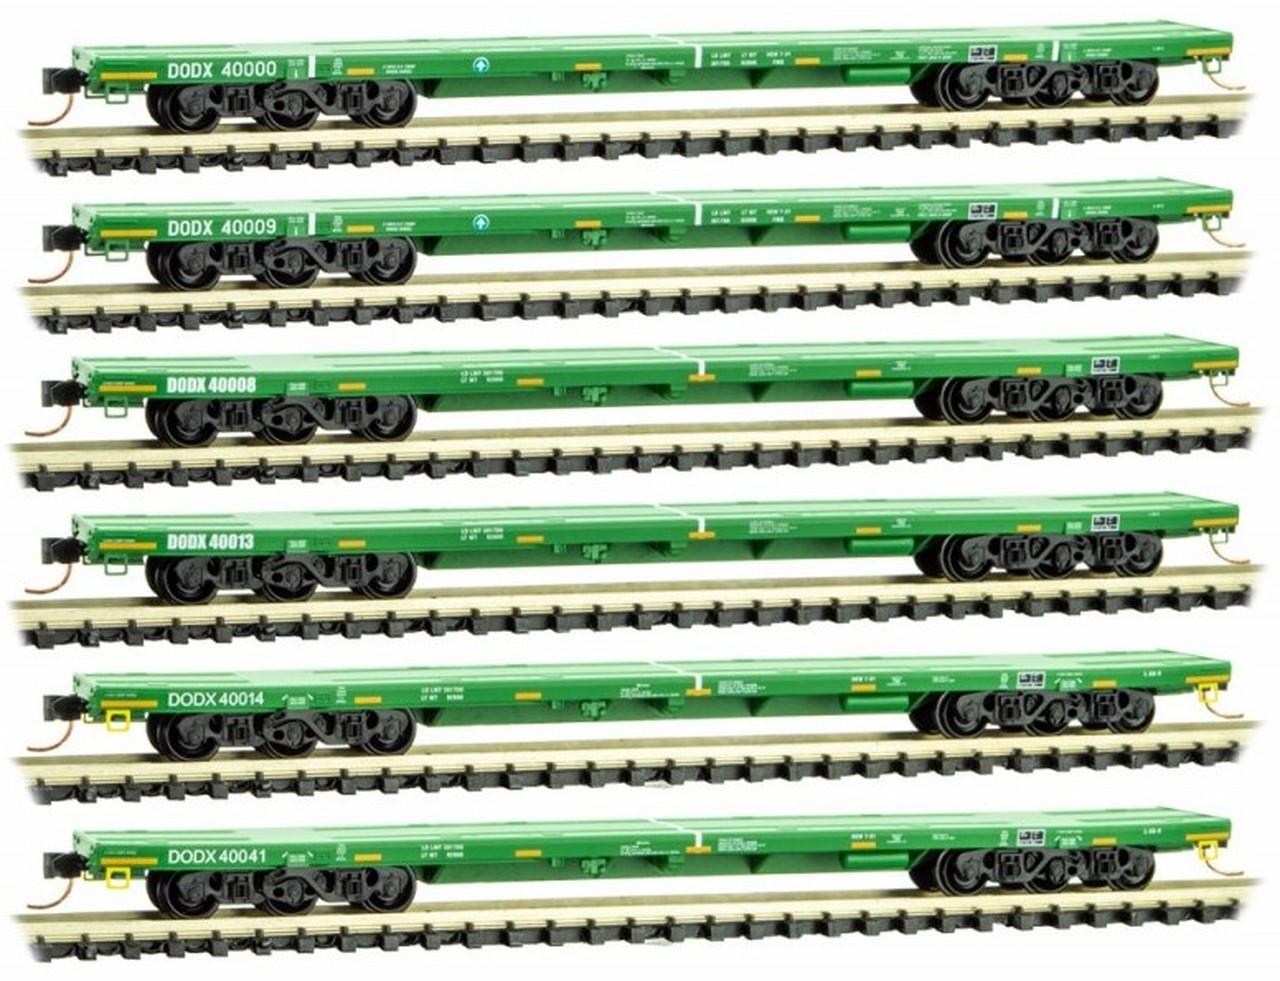 Micro Trains 993 01 611 DODX'  Cascade Green Flat Car 6 pack N Scale